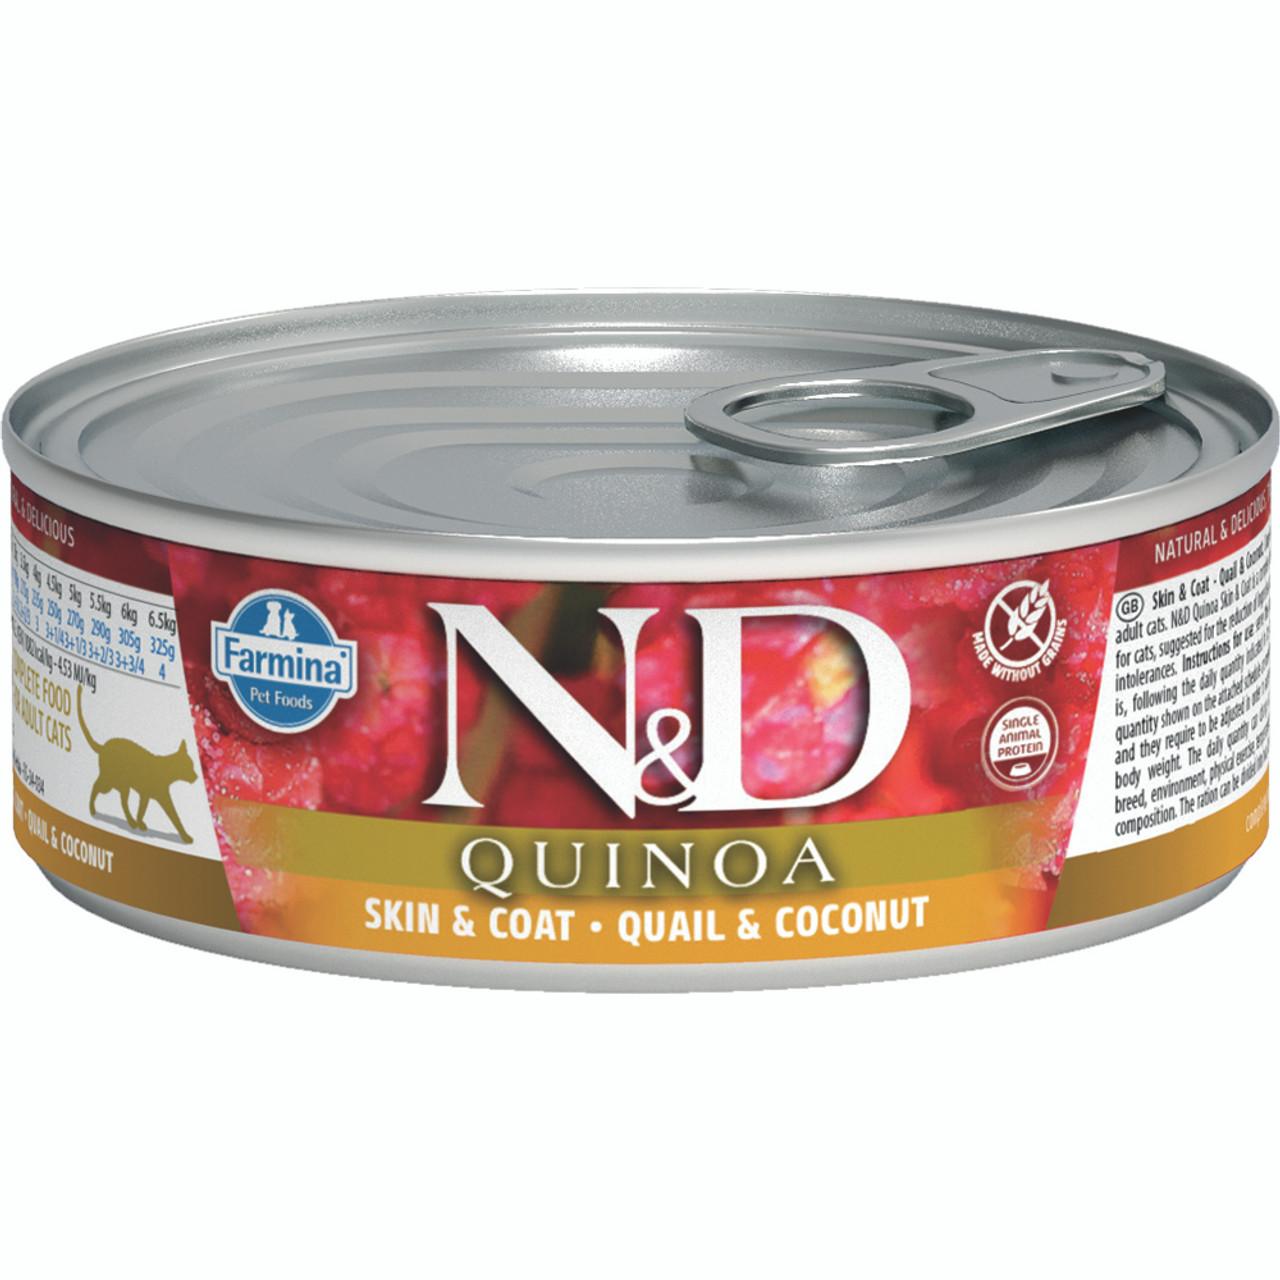 Farmina N&D Quinoa Skin & Coat Quail & Coconut Recipe Adult Canned Cat Food